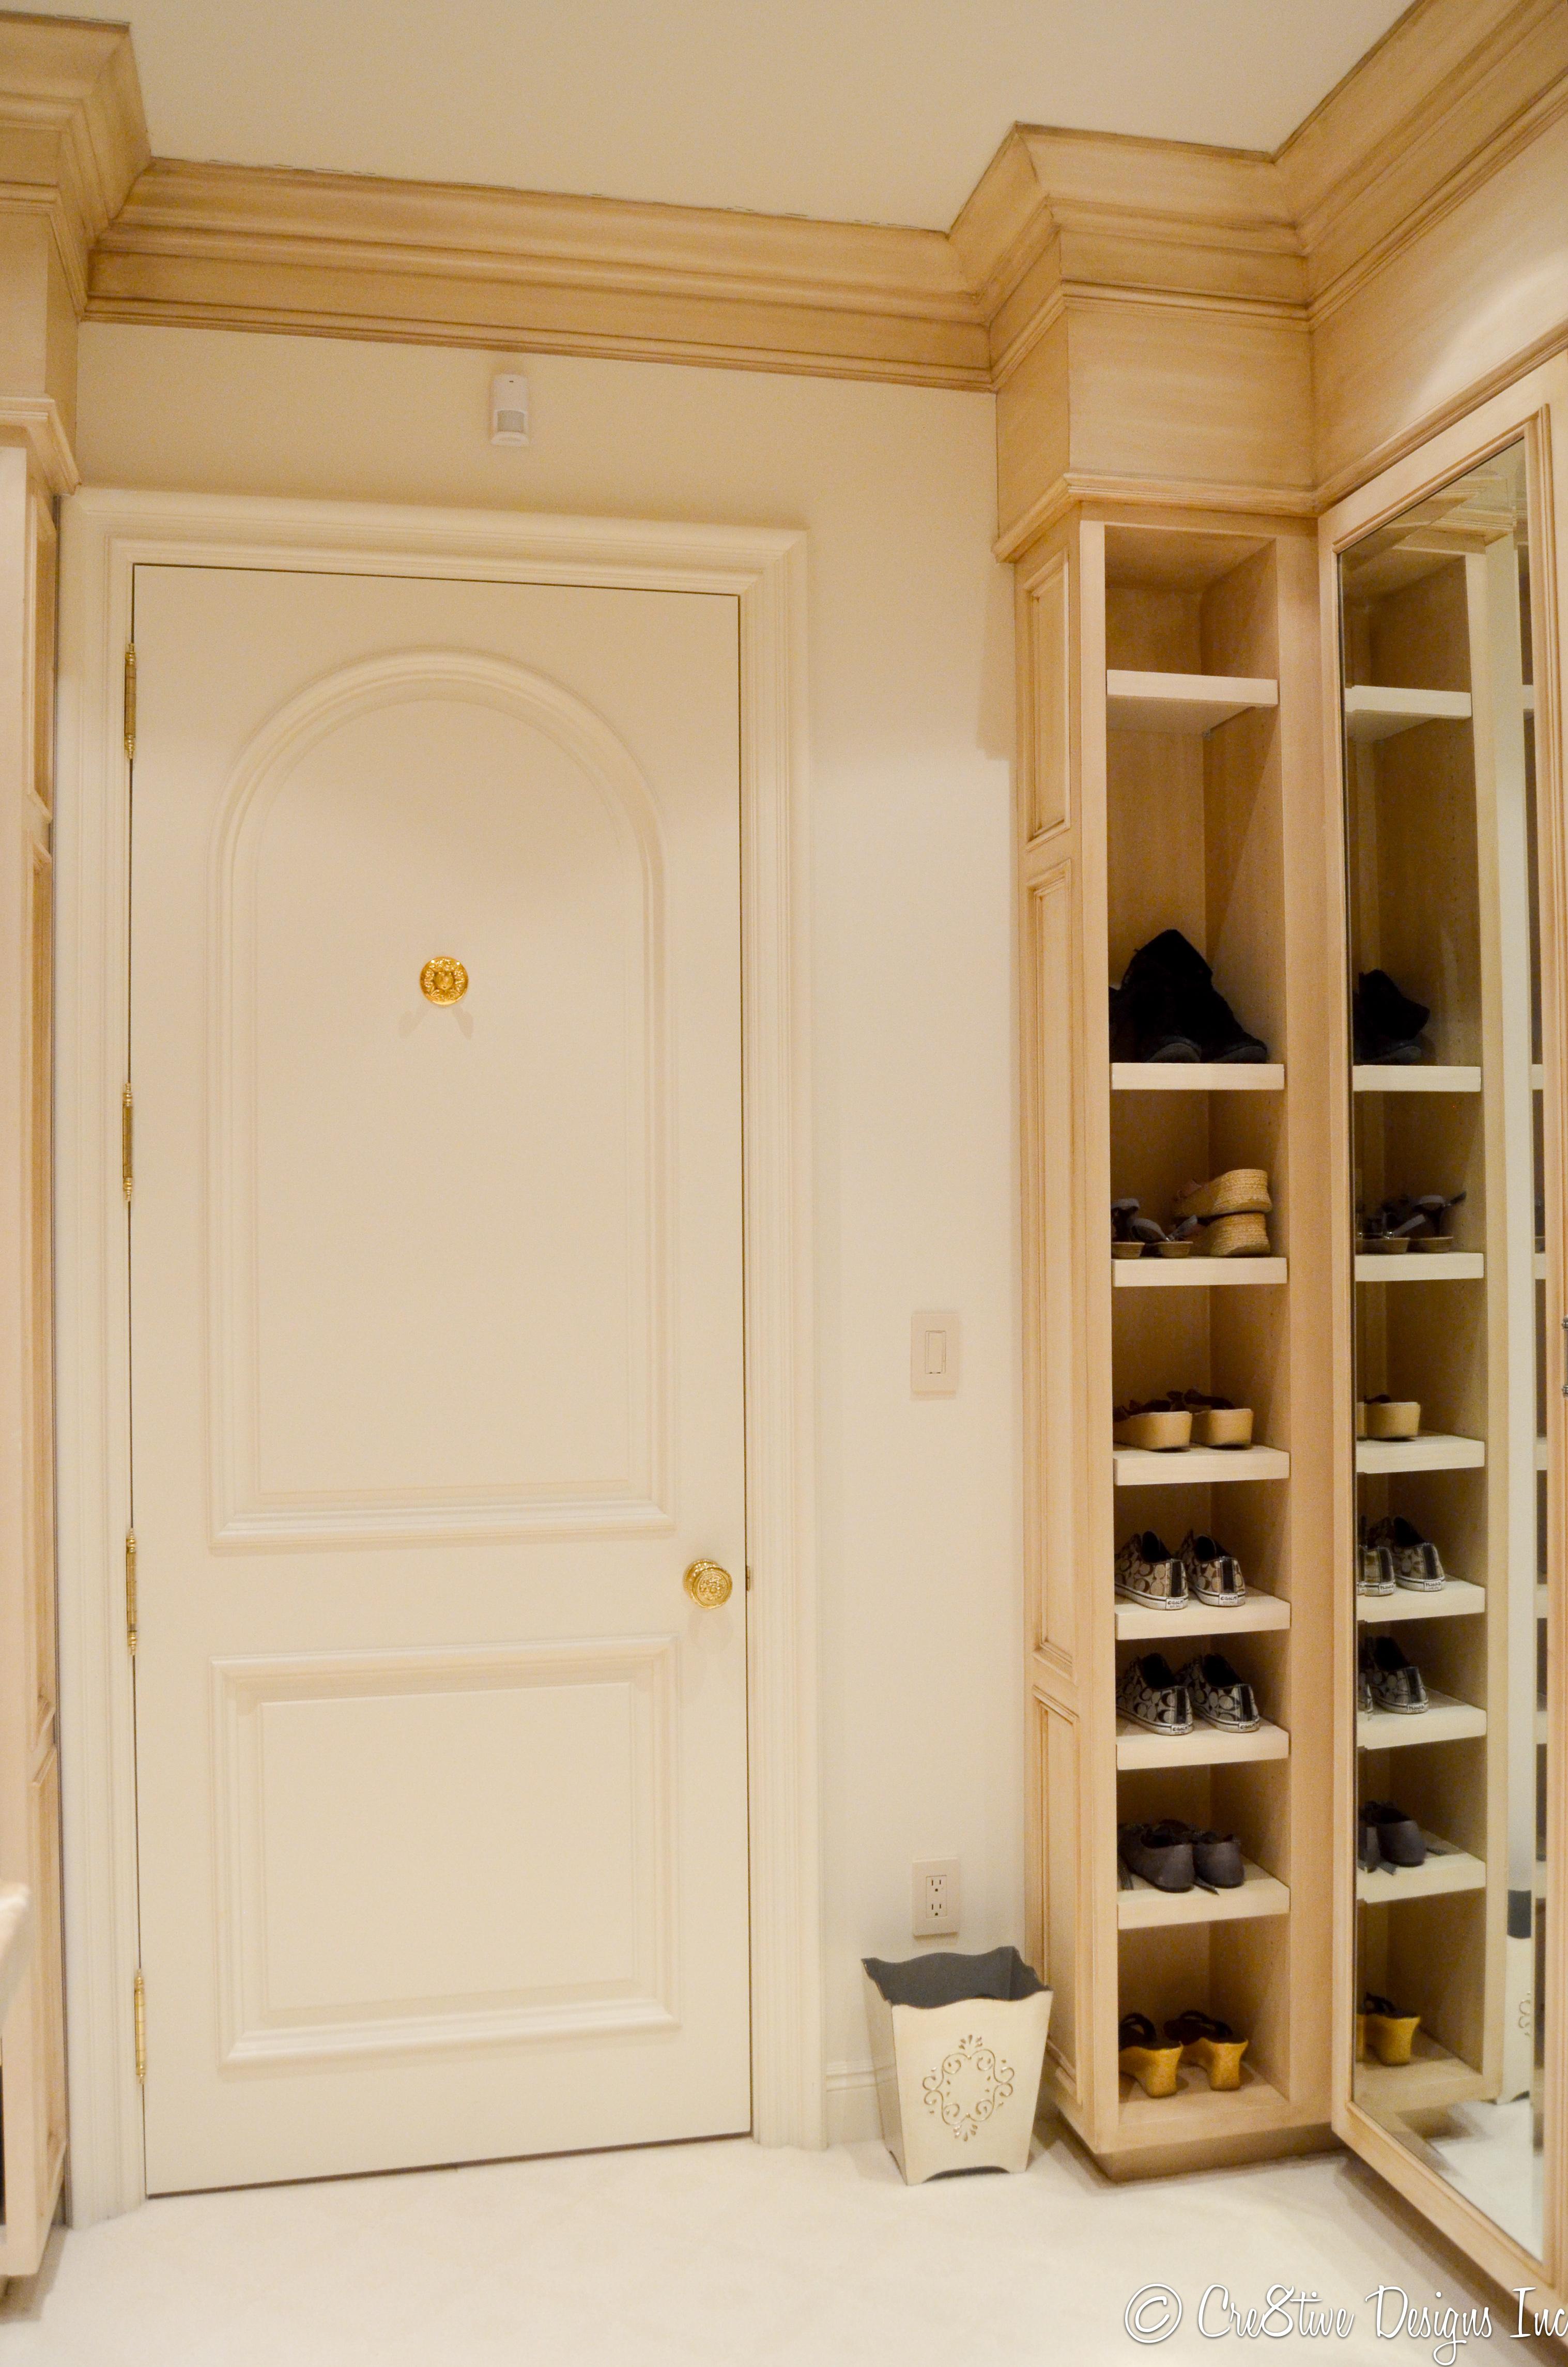 Wall Closet Wonderful Built In Wardrobe Designs Looks Inexpensive